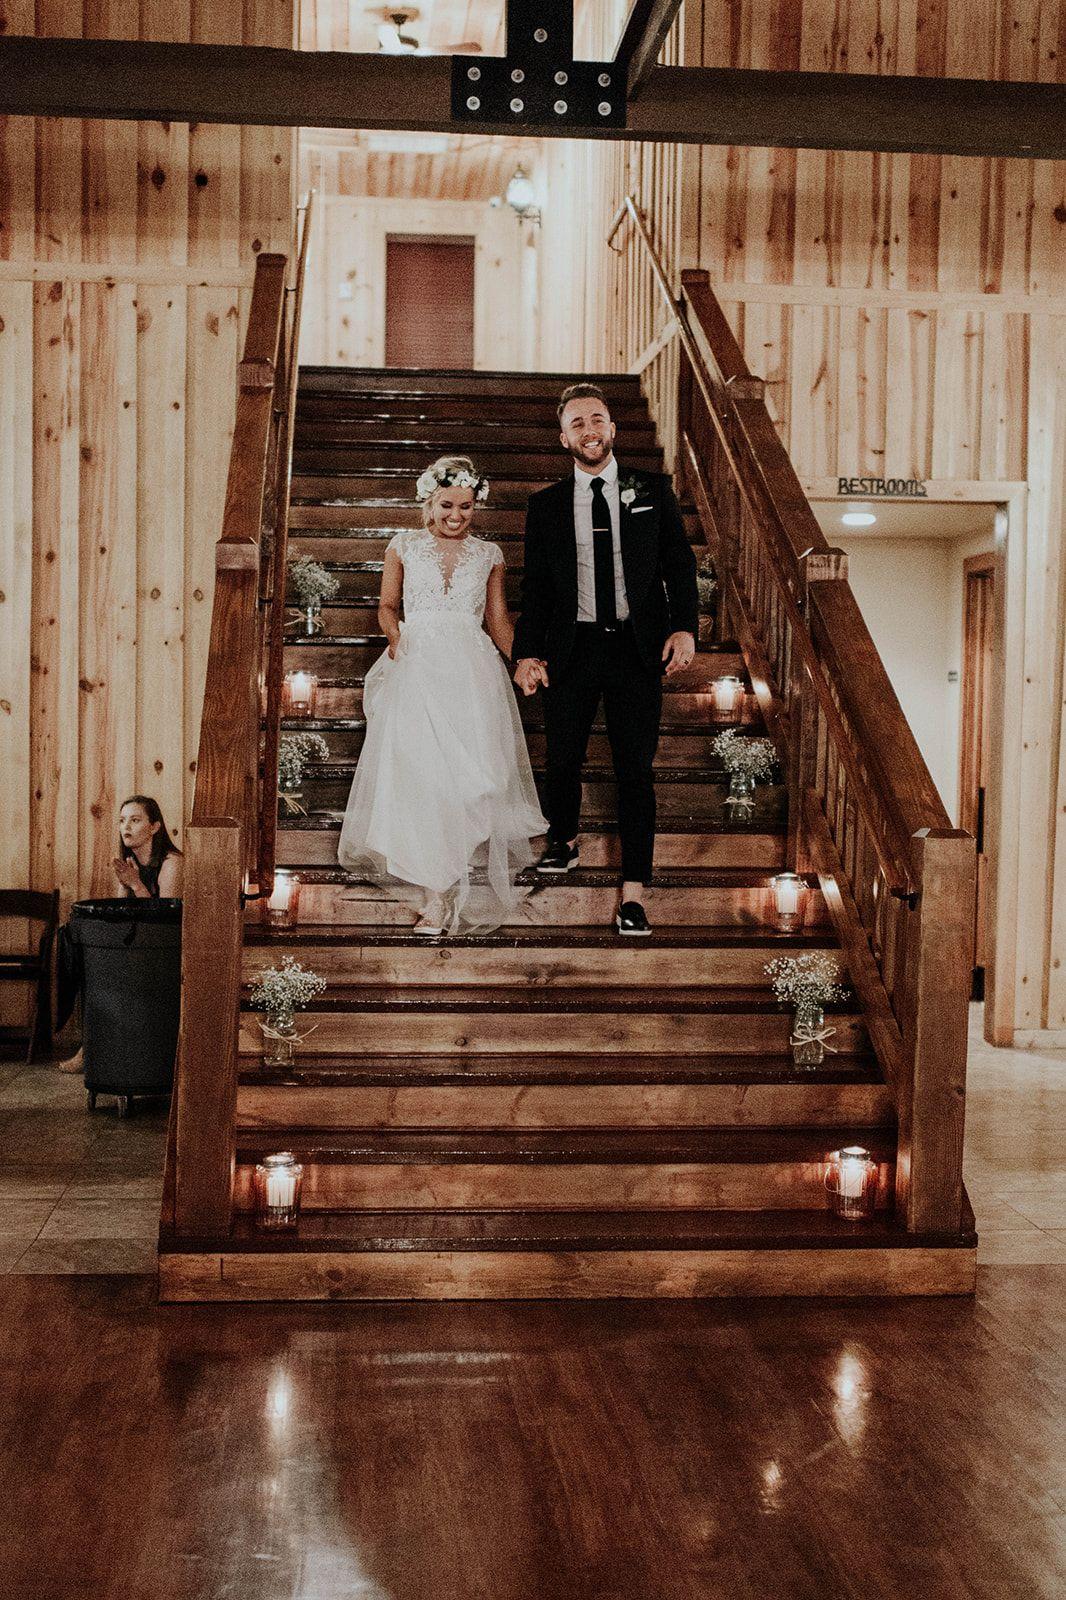 Oklahoma City Wedding Venue in Edmond | Wedding staircase ...